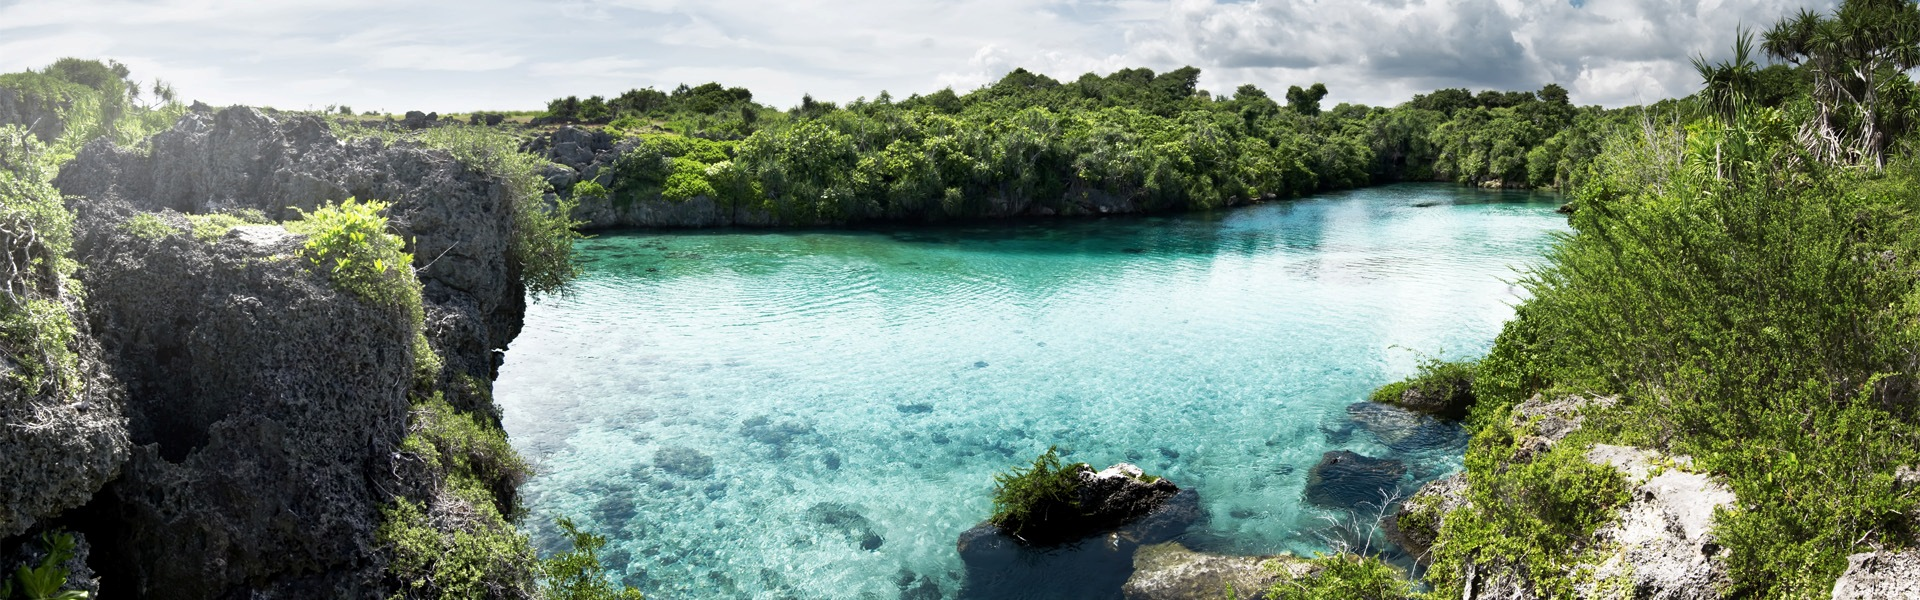 Fabulous Weekuri Lake, Sumba Indonesia